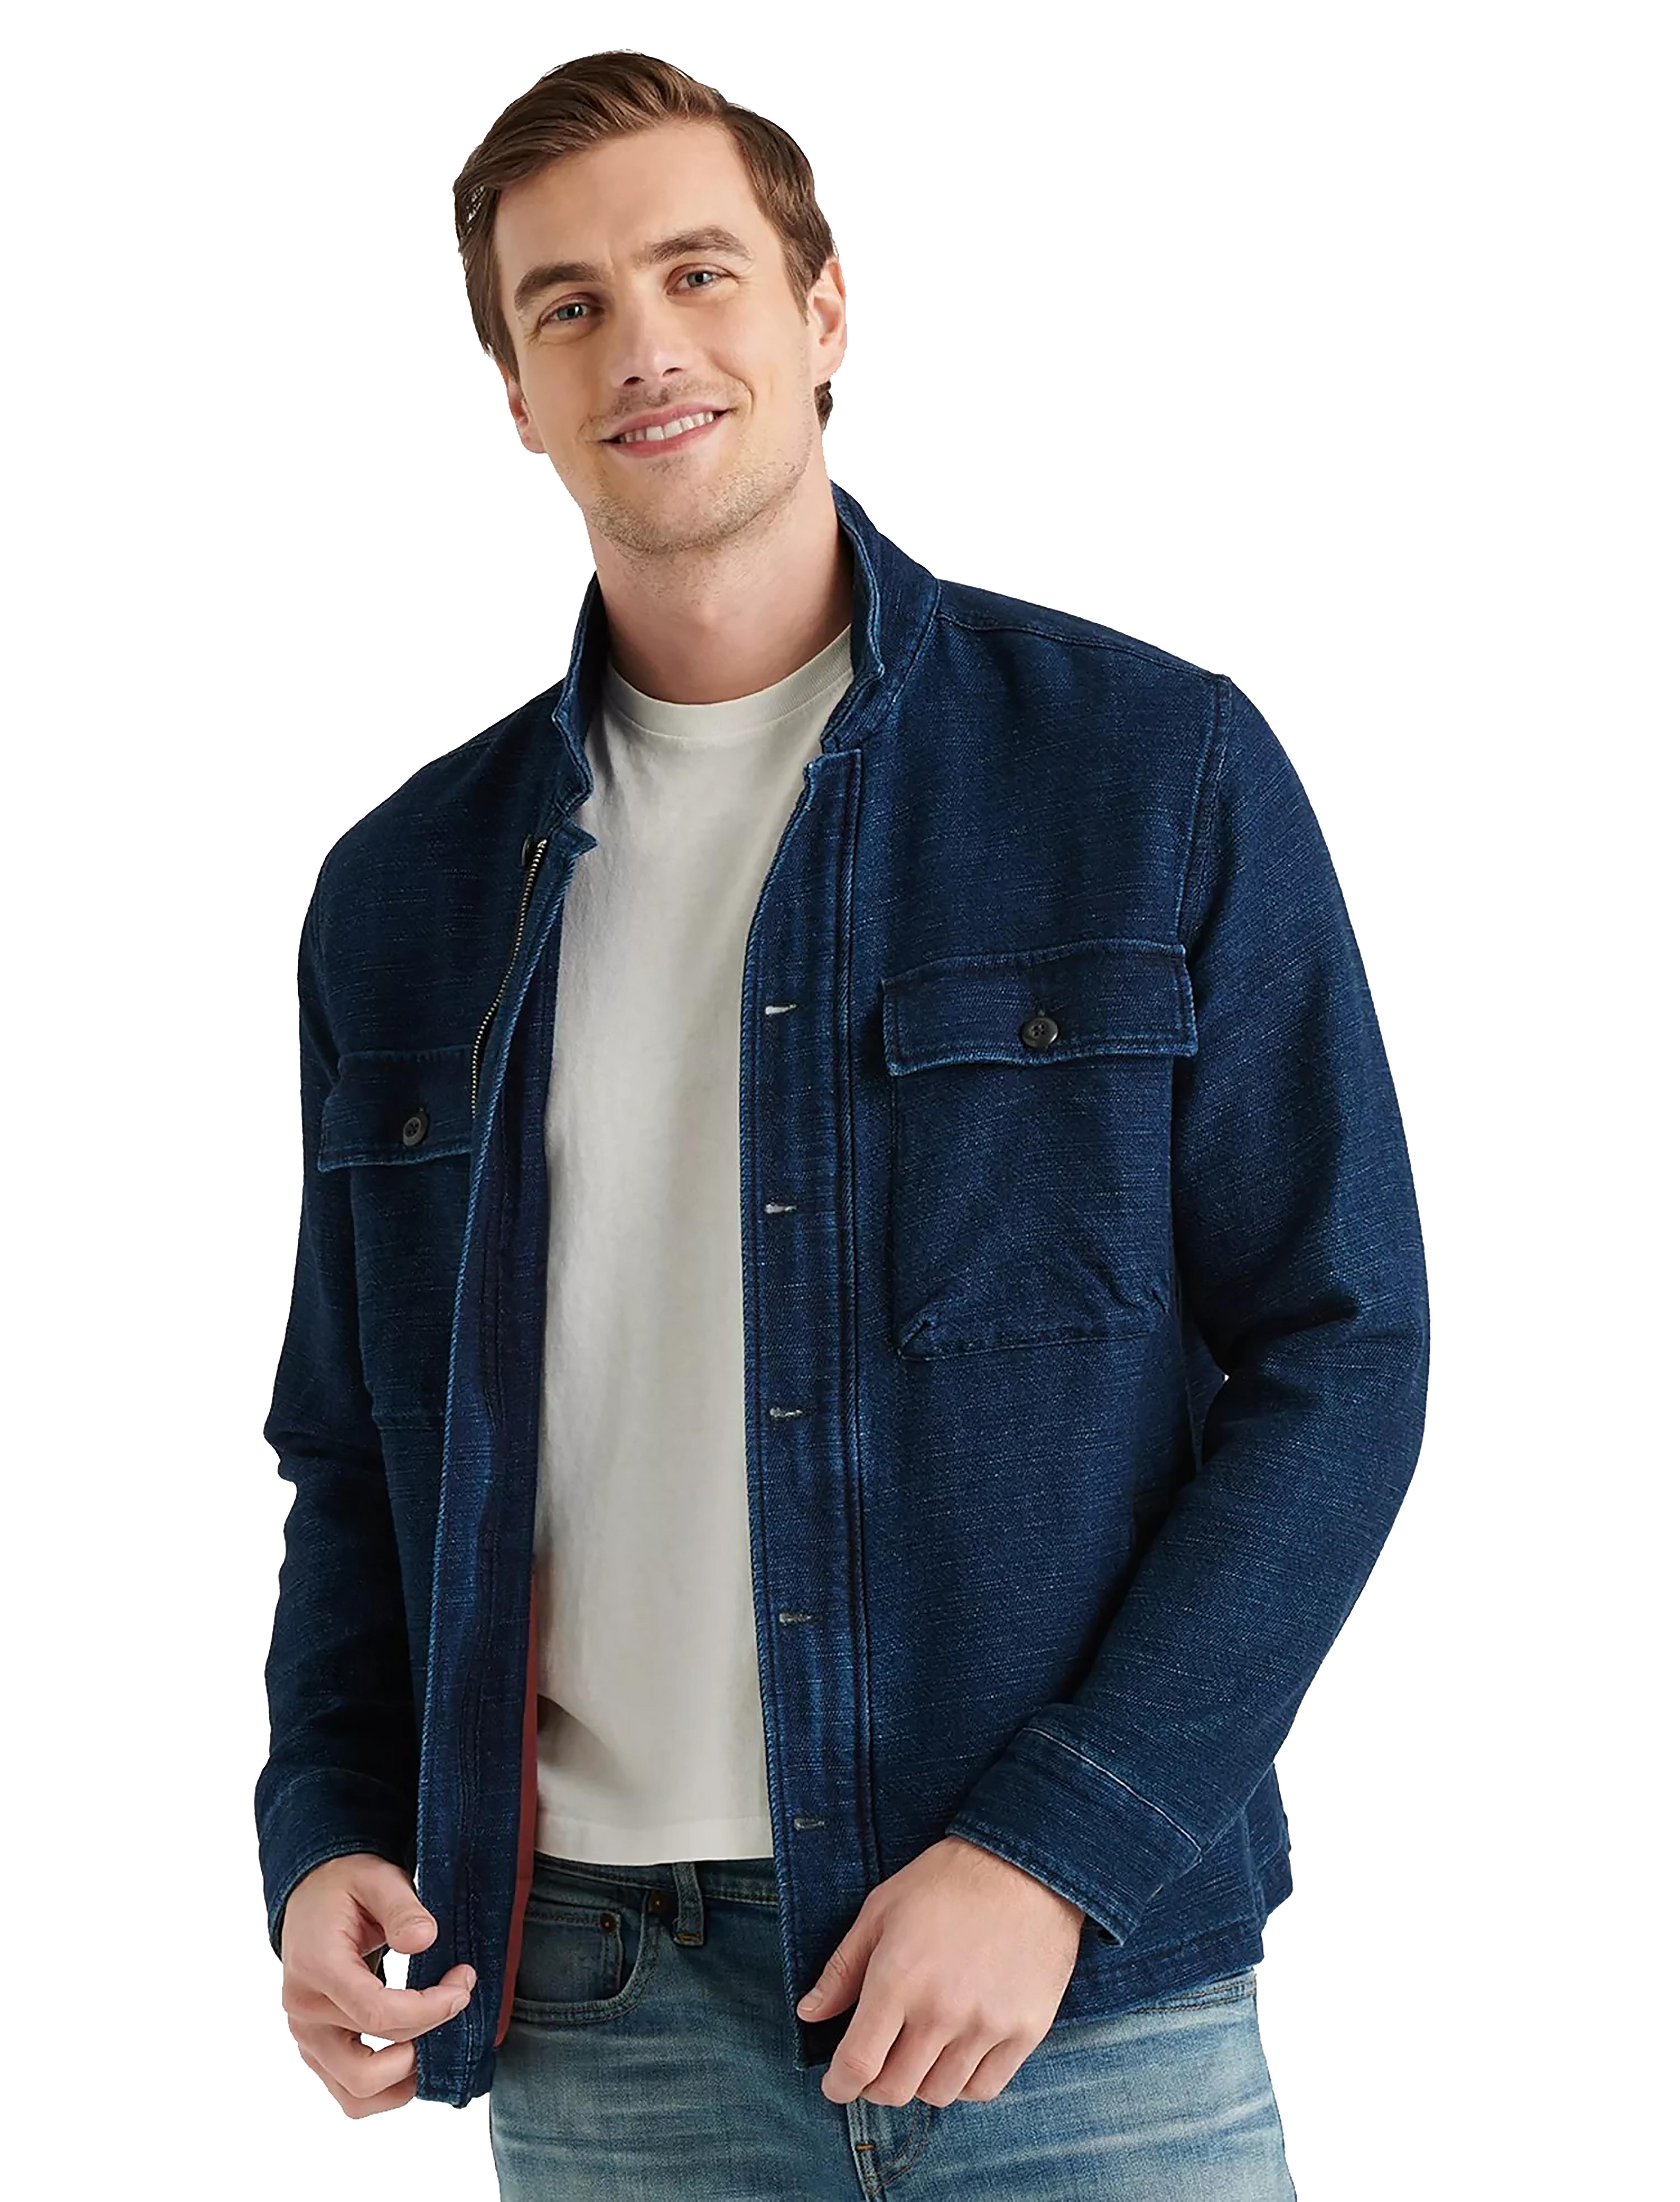 Men's Lucky Brand Jackets: Indigo Zip Denim $35, Chambray Cotton-Hemp M65 Utility Jacket $60, Sherpa Jacket $40 & MORE + Free S/H